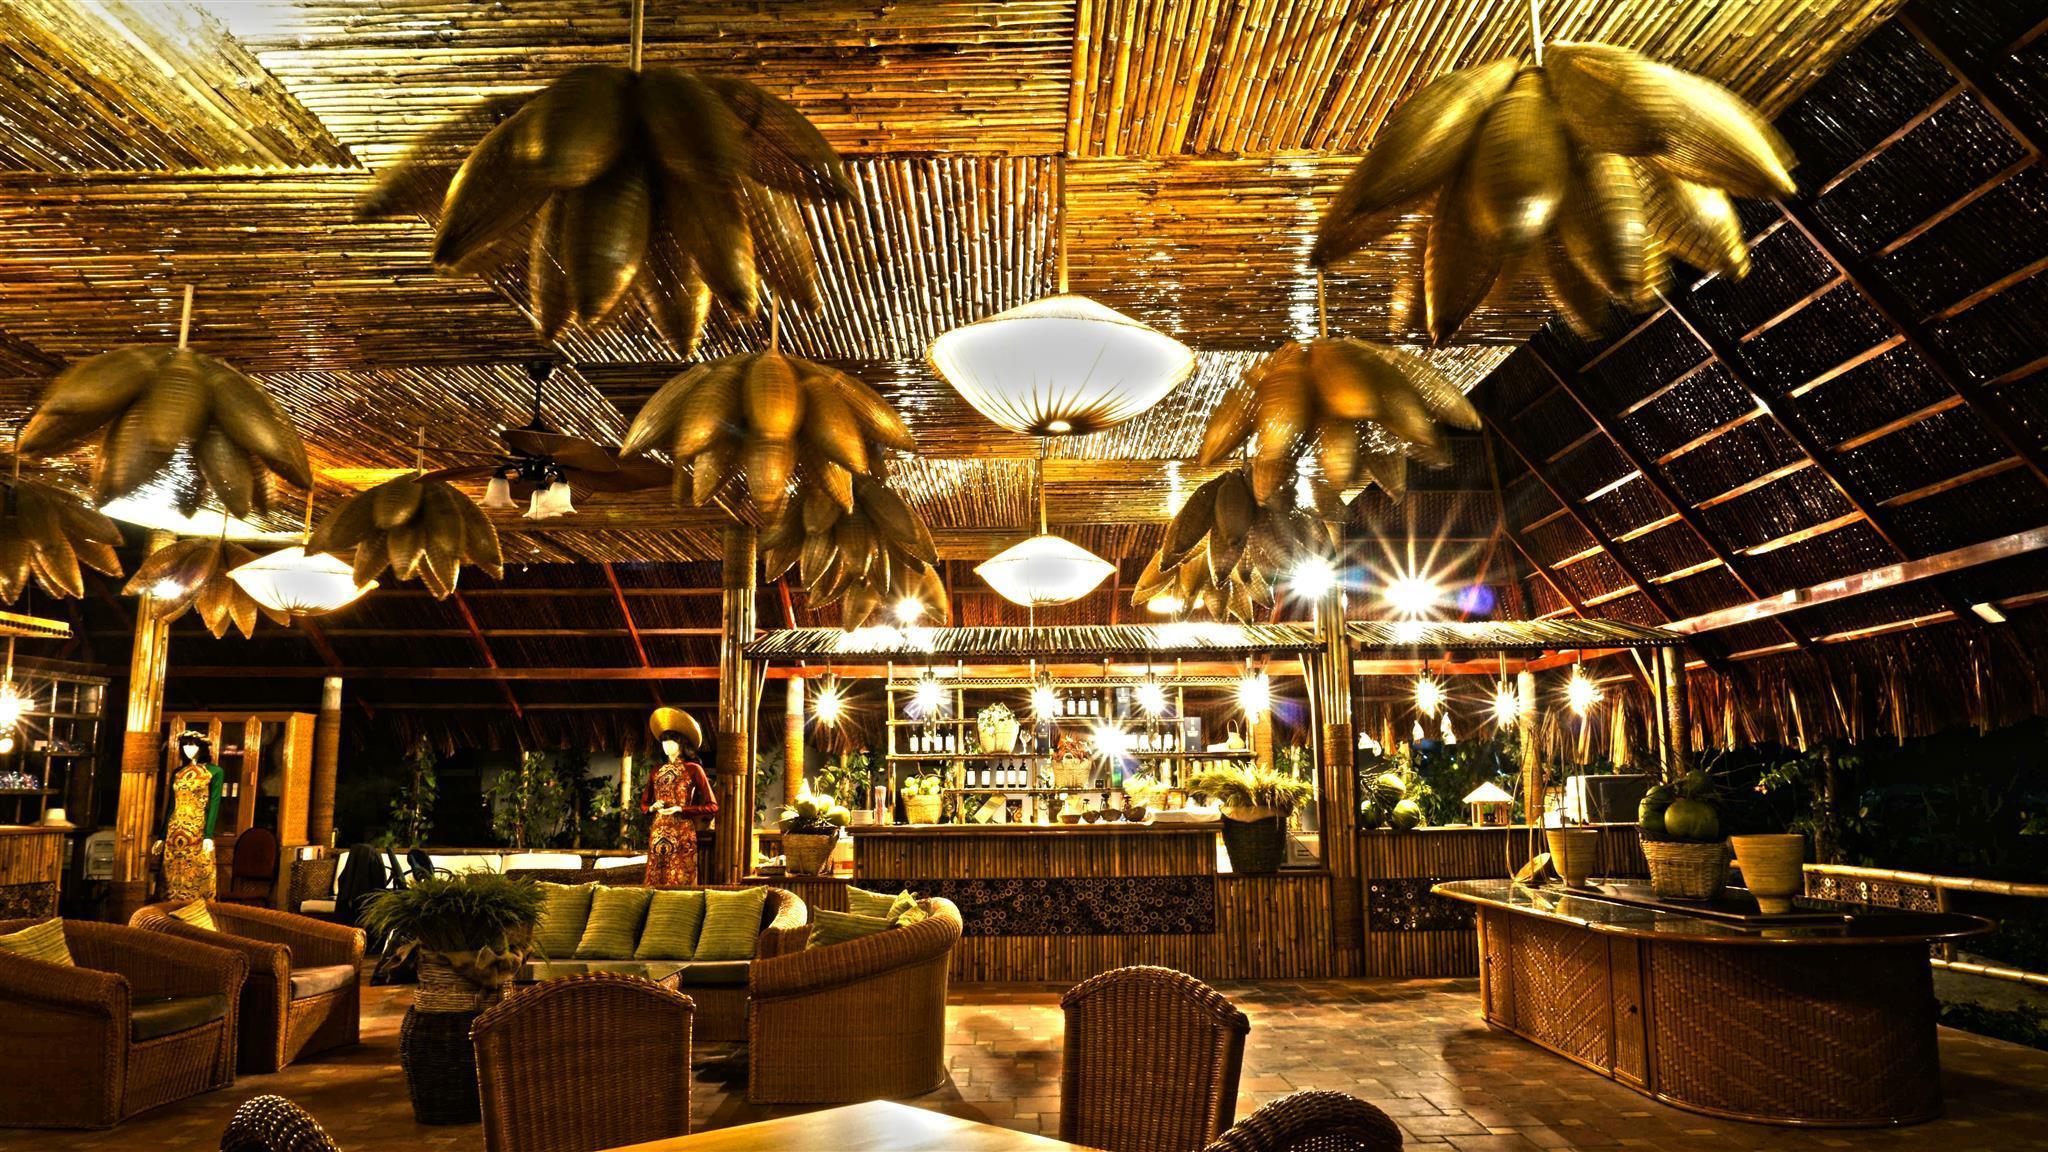 The Light Coral Island Resort, Van Ninh